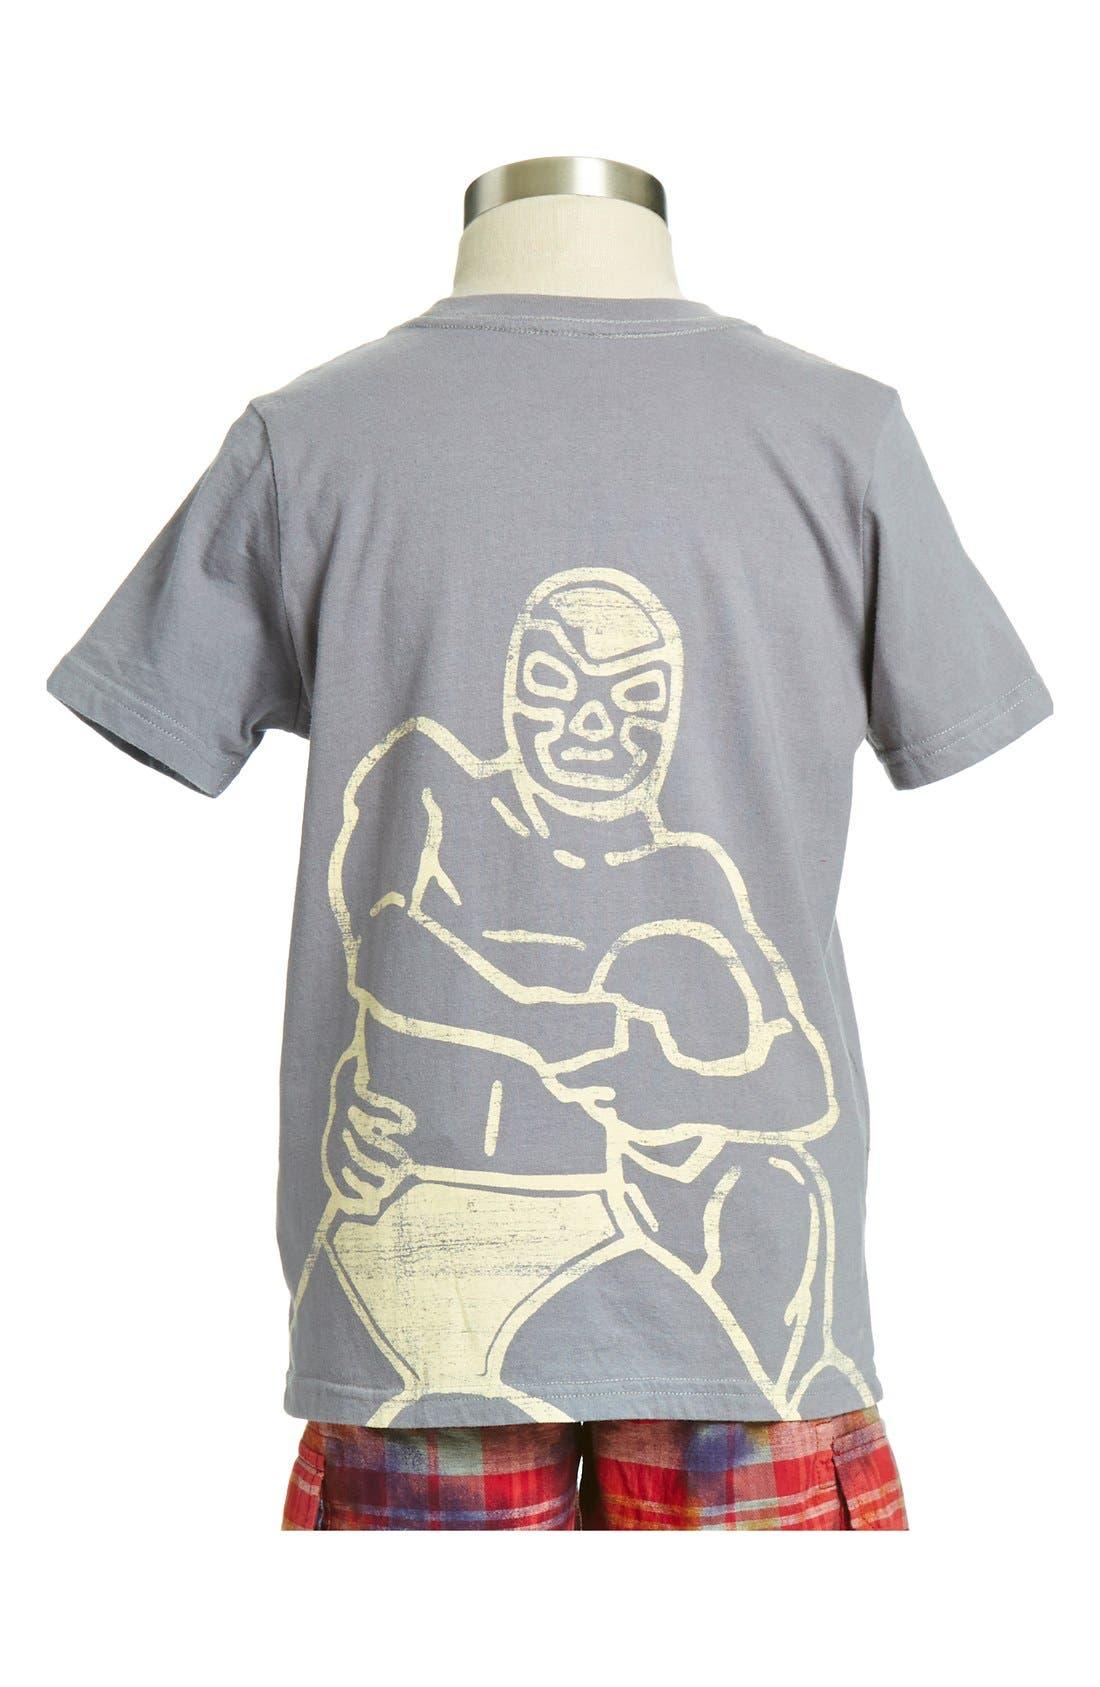 Alternate Image 2  - Peek 'Wrestling' Cotton T-Shirt (Toddler Boys, Little Boys & Big Boys)